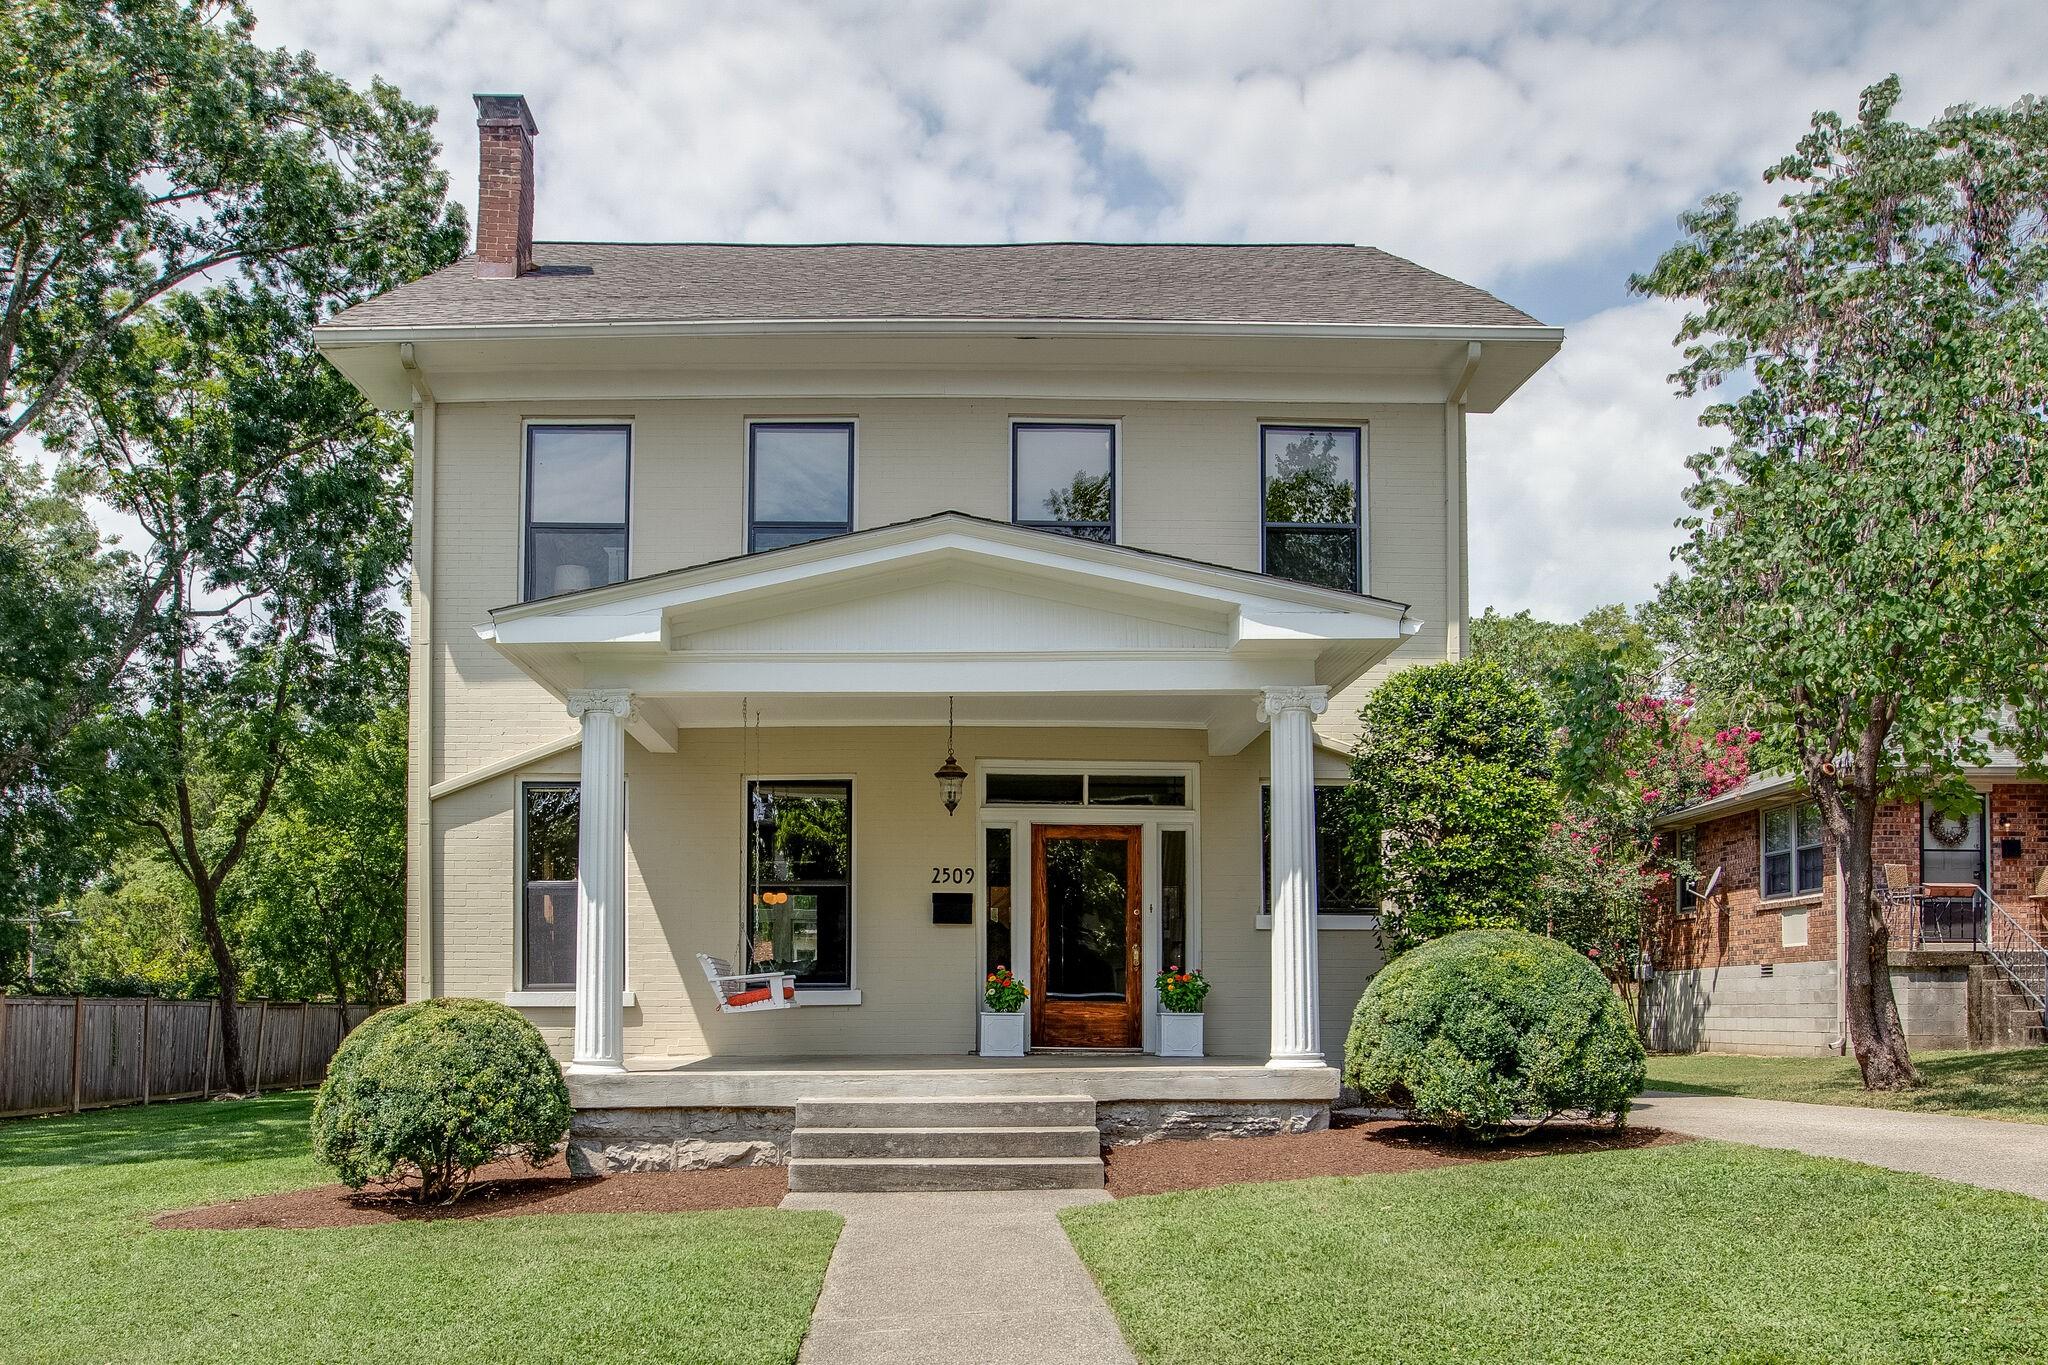 2509 Oakland Ave Property Photo - Nashville, TN real estate listing